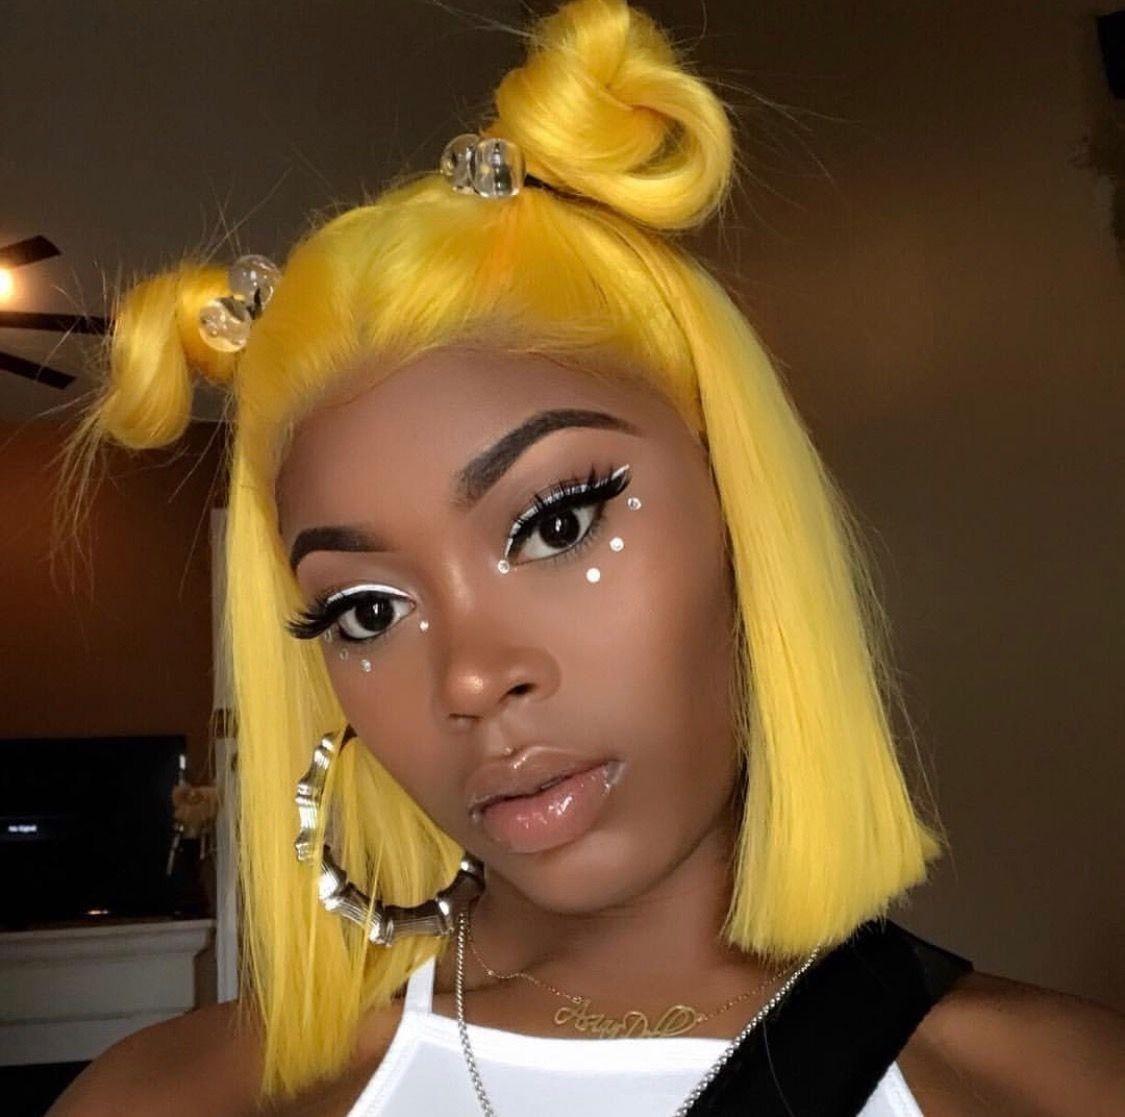 Pin by imni on ubaddies in pinterest hair styles